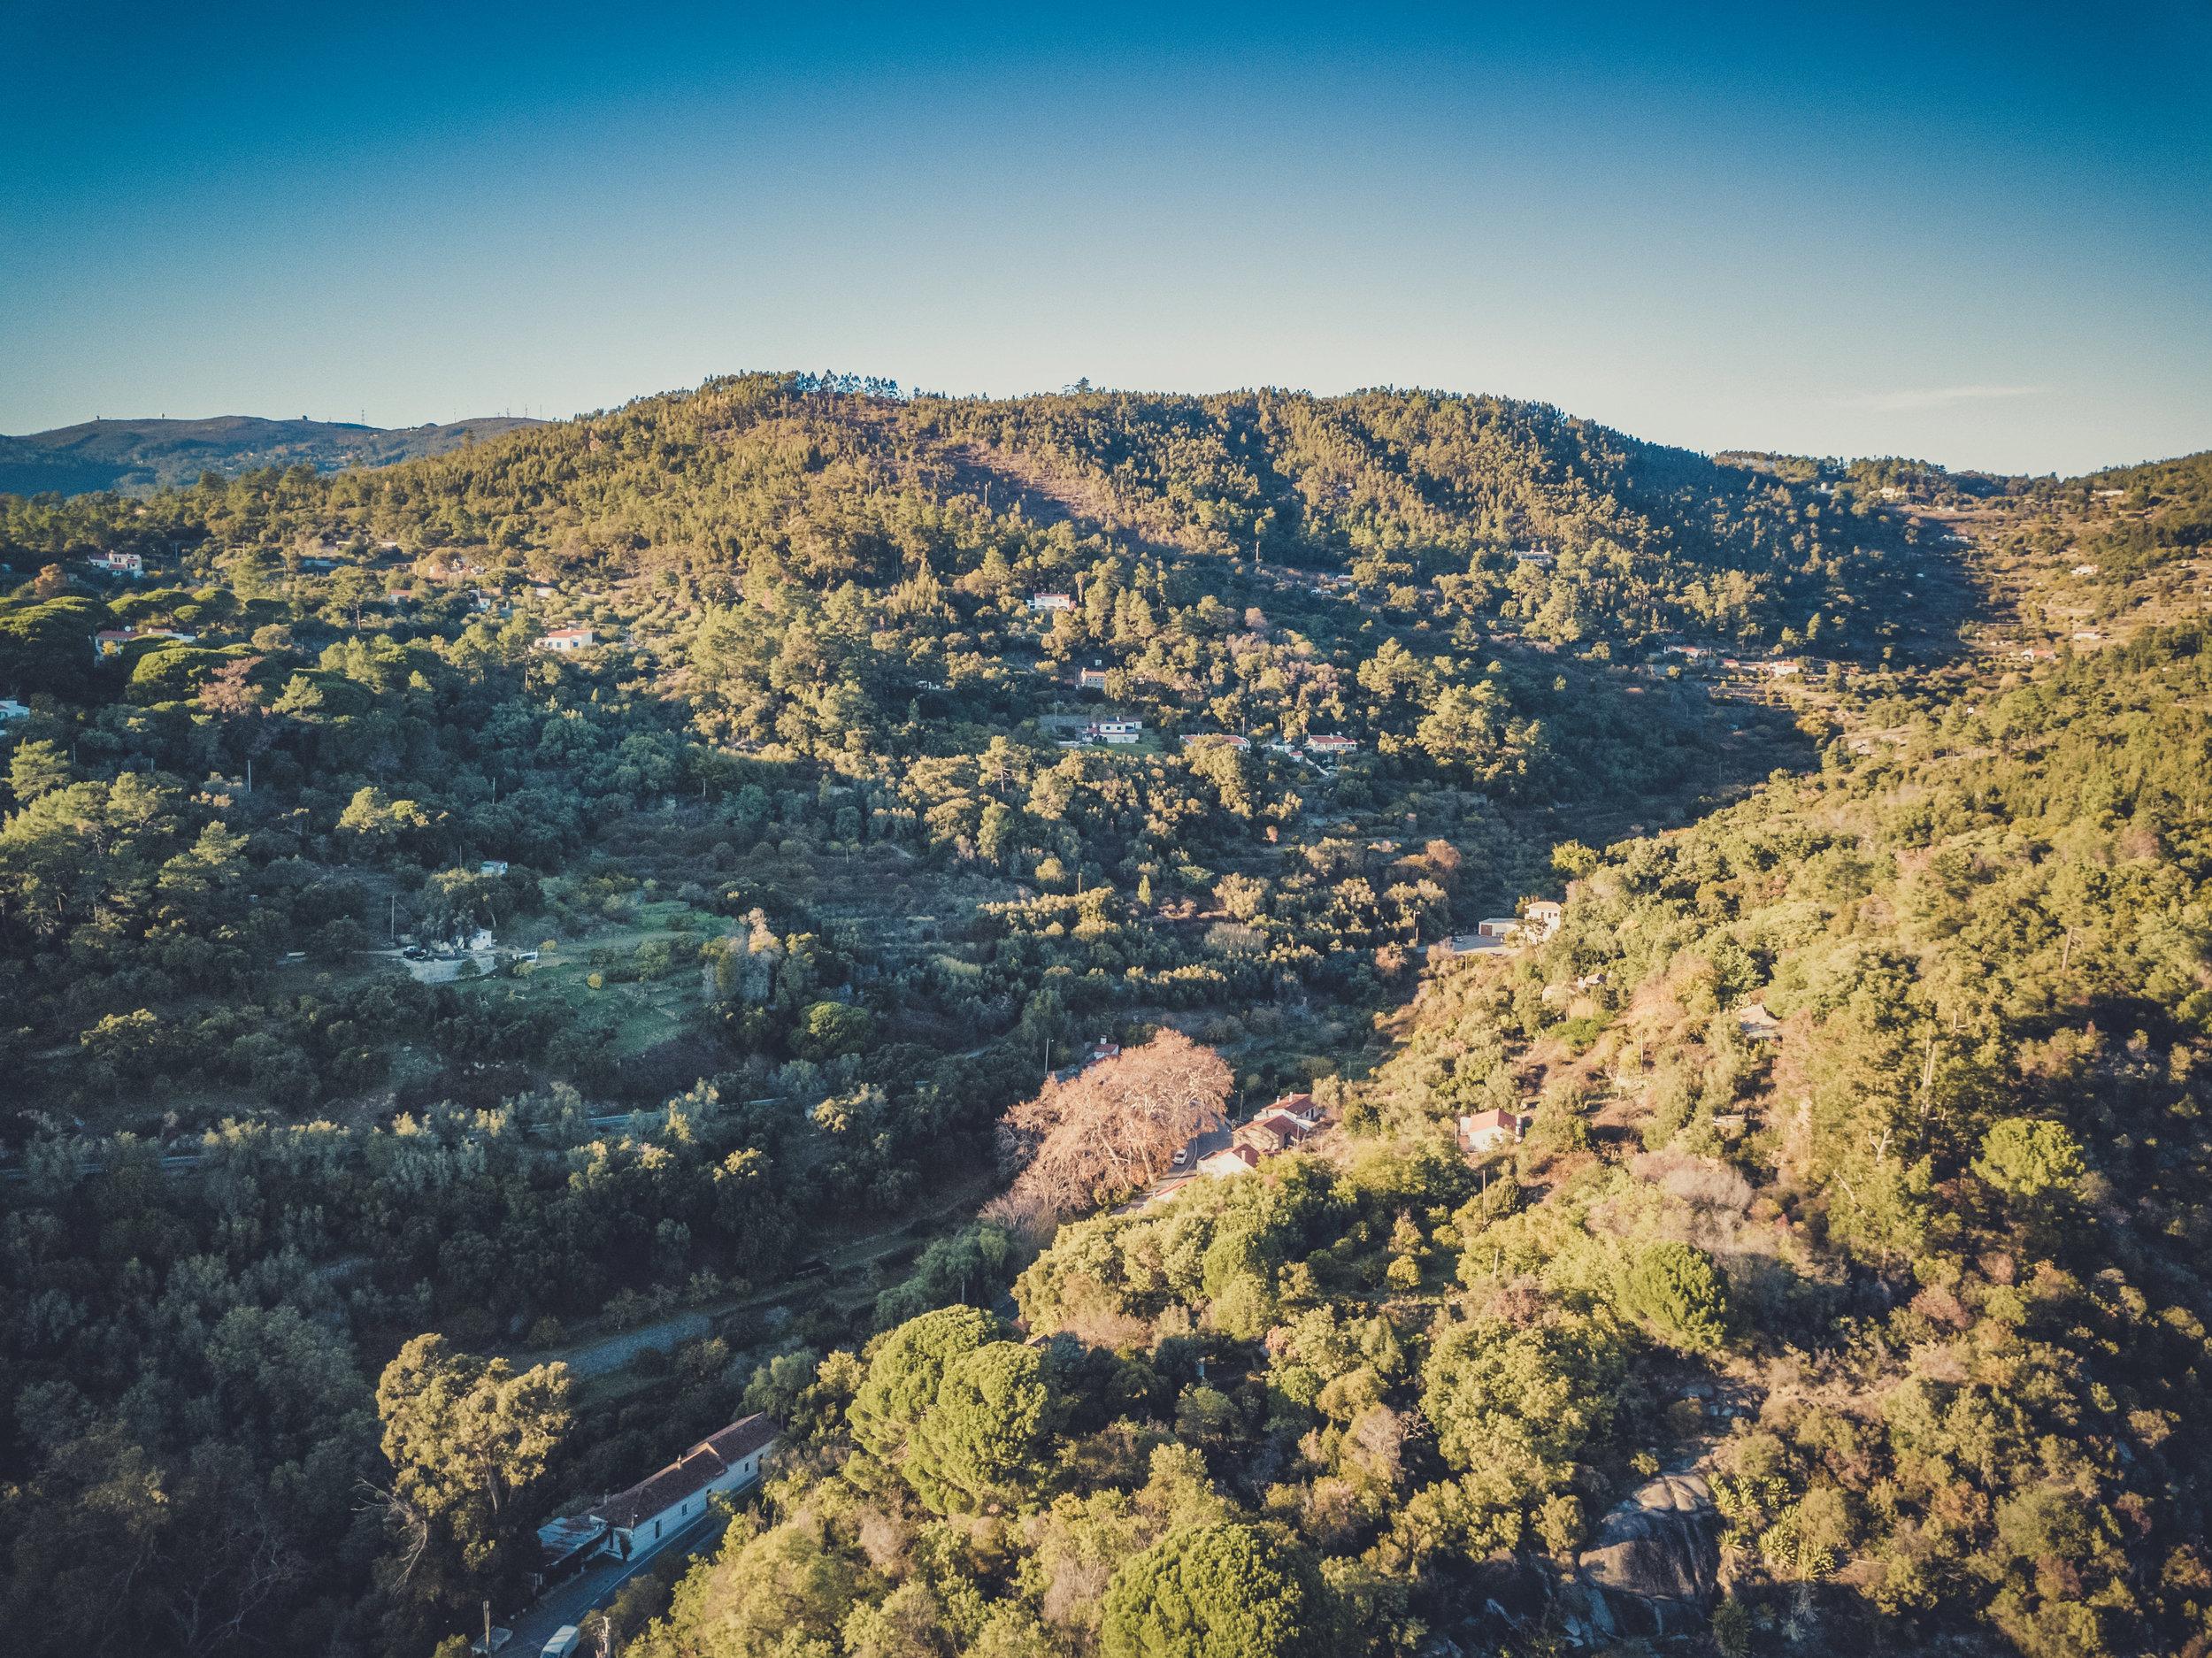 barbelote waterfall monchique portugal. hiking trail. walking trail. evil trees. lots of trees. cork trees. Drone shot.jpg